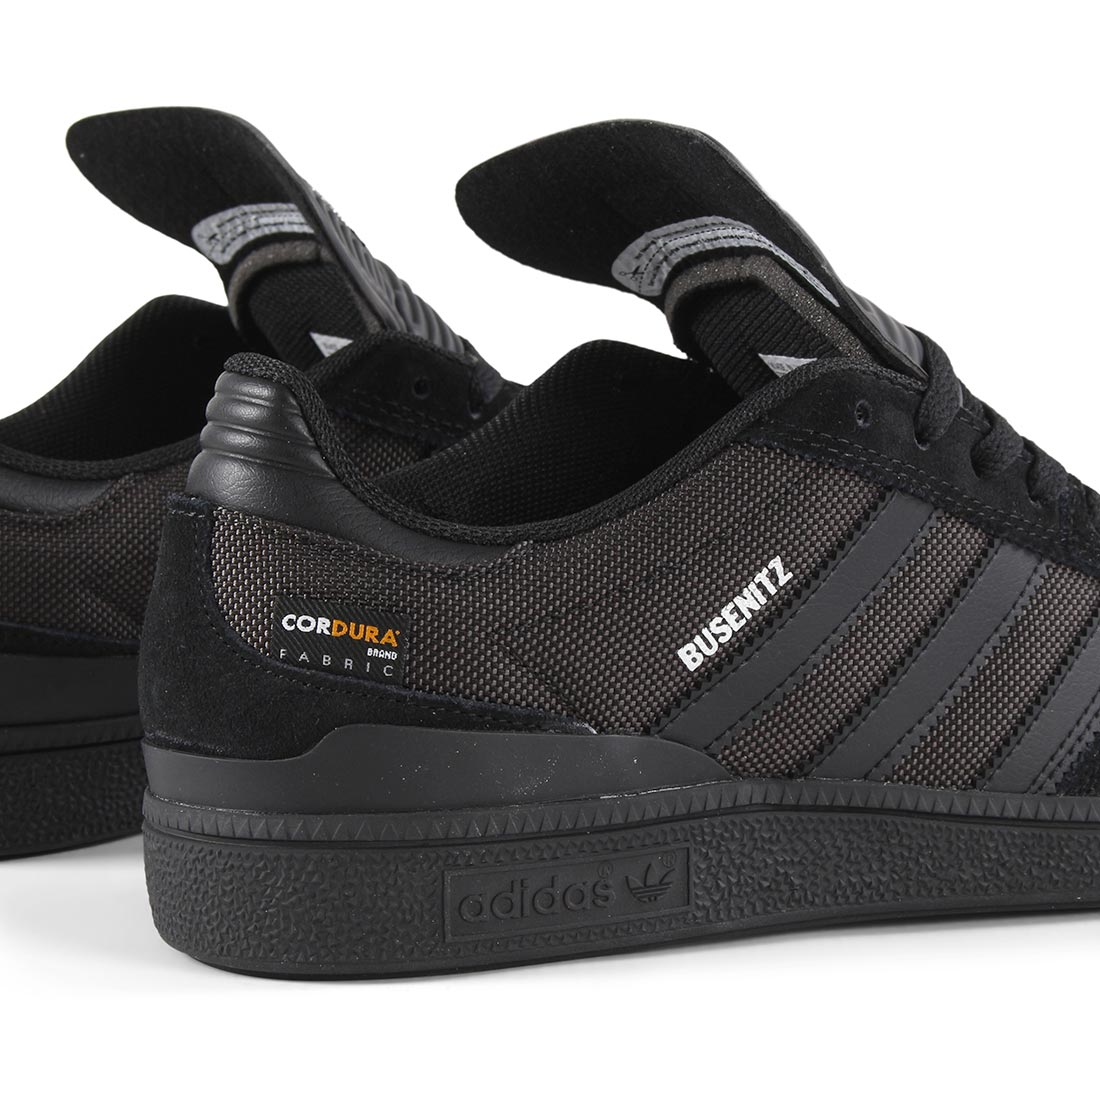 Adidas Busenitz Pro Shoes - Core Black   Core Black   Core Black 6acf391fe